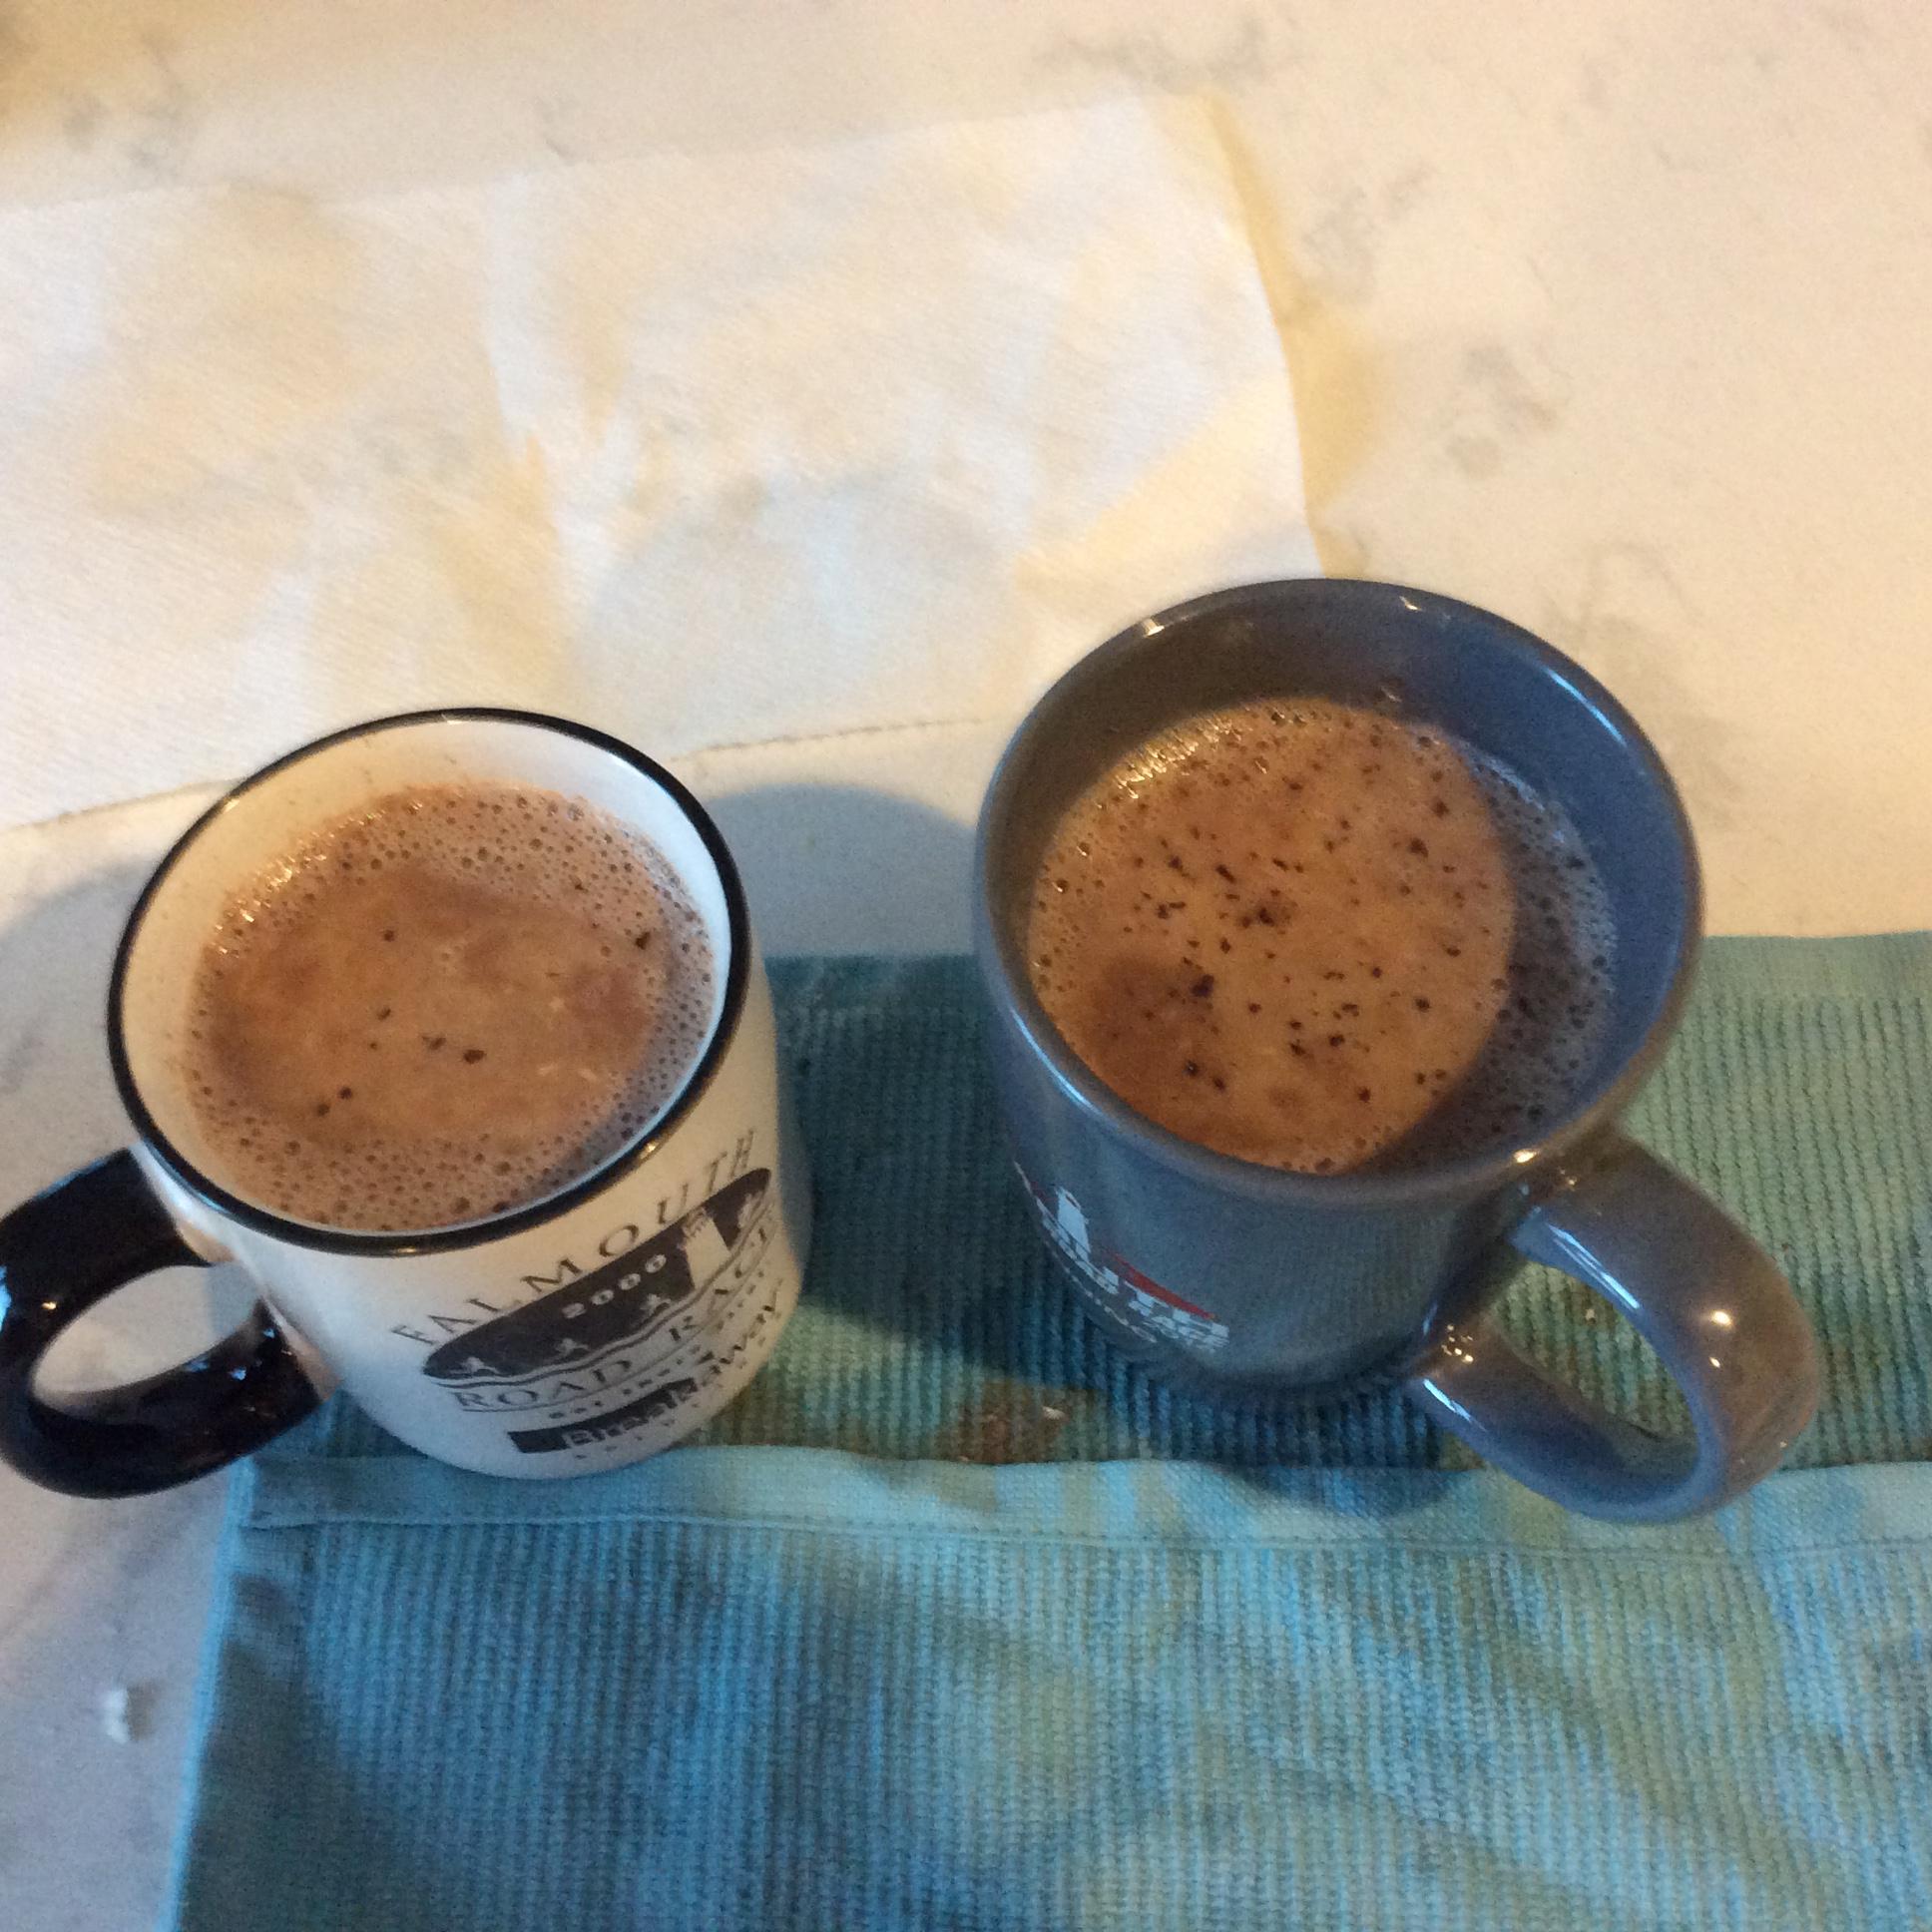 Hot Chocolate Aida Yosnita Midjan Huft